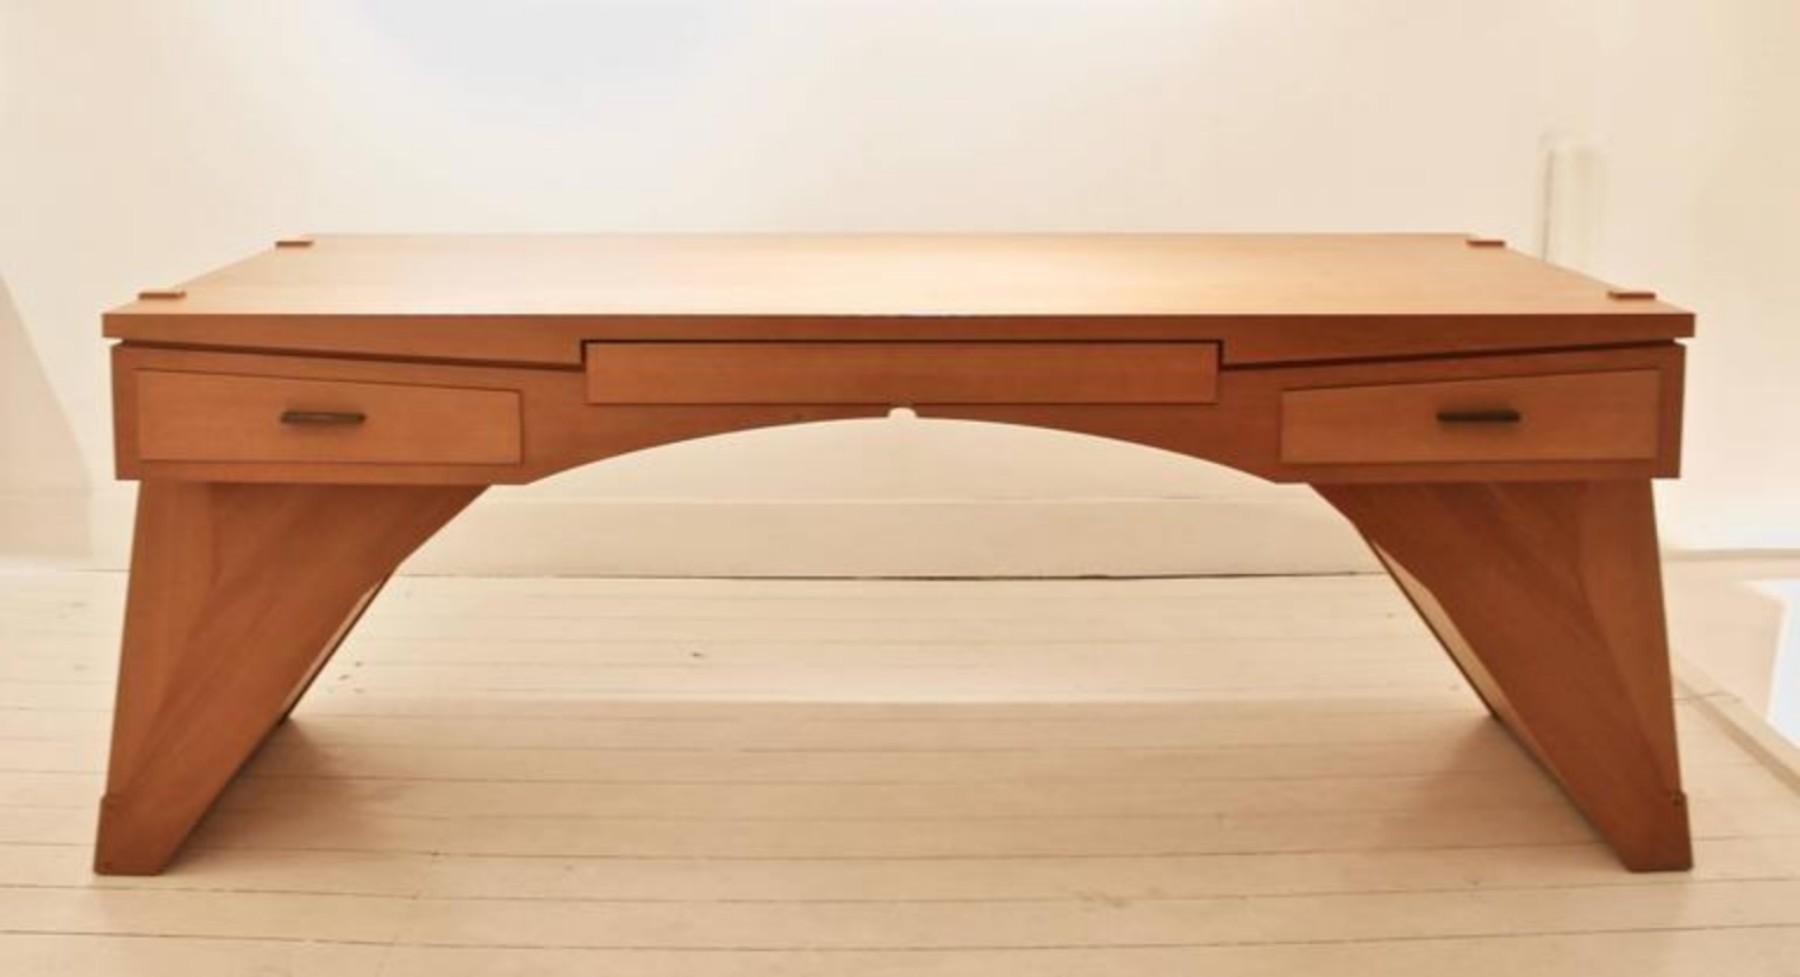 Arch Bridge Late 20th Century Constructivist Desk In Pear Wood Ed Weinberger Furniture